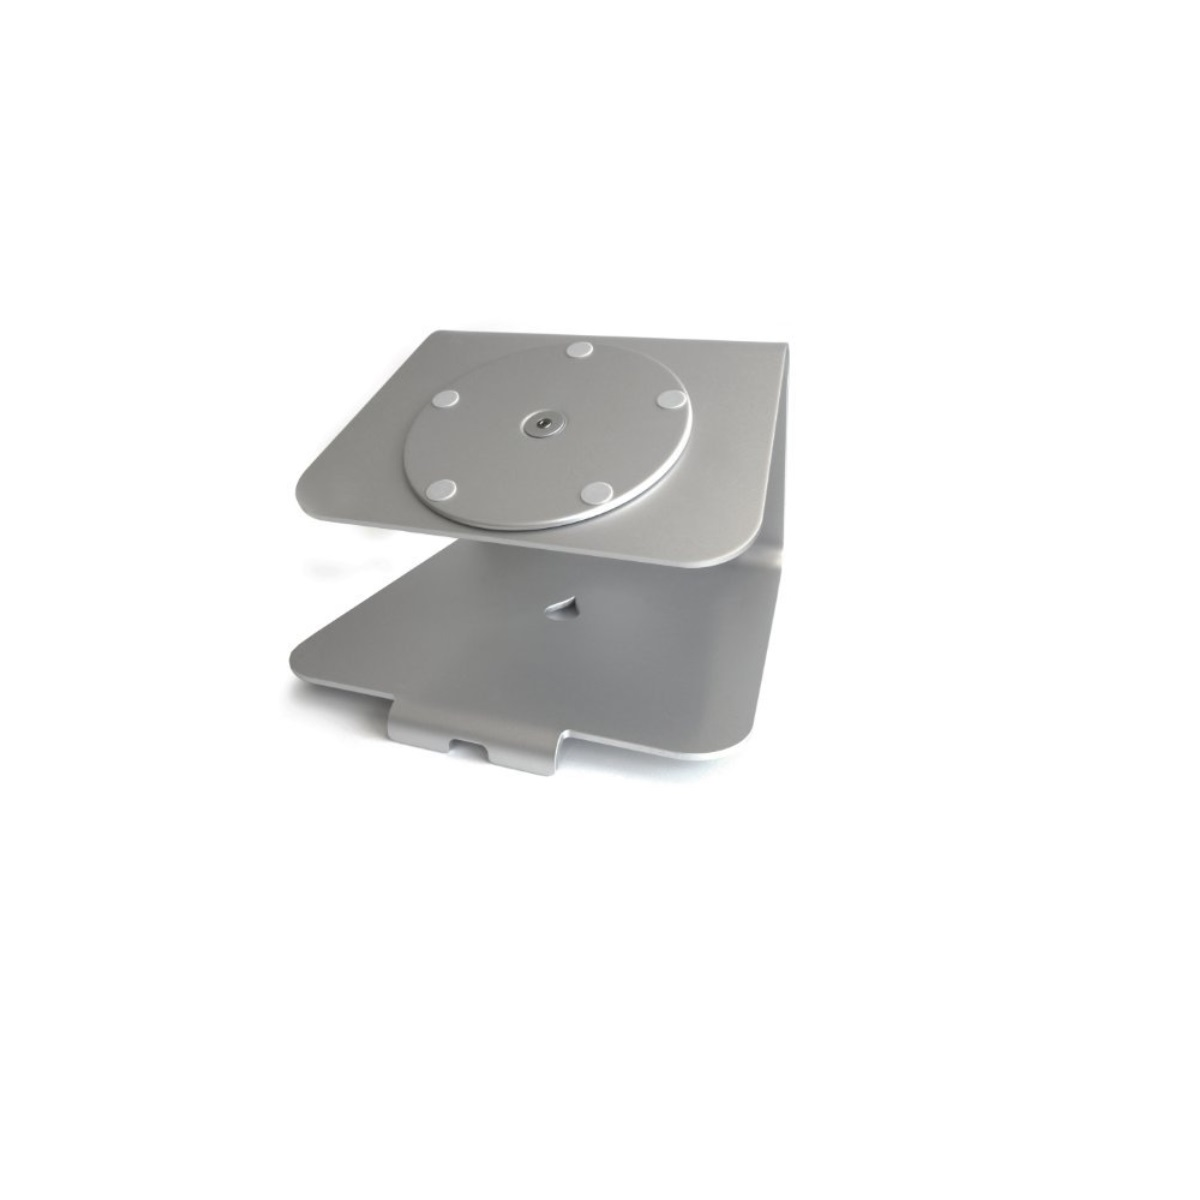 Suport Rain Design Laptop Stand, Space Gray pentru Apple MacBook Pro Retina Touch Bar, mStand cu rotire la 360 grade